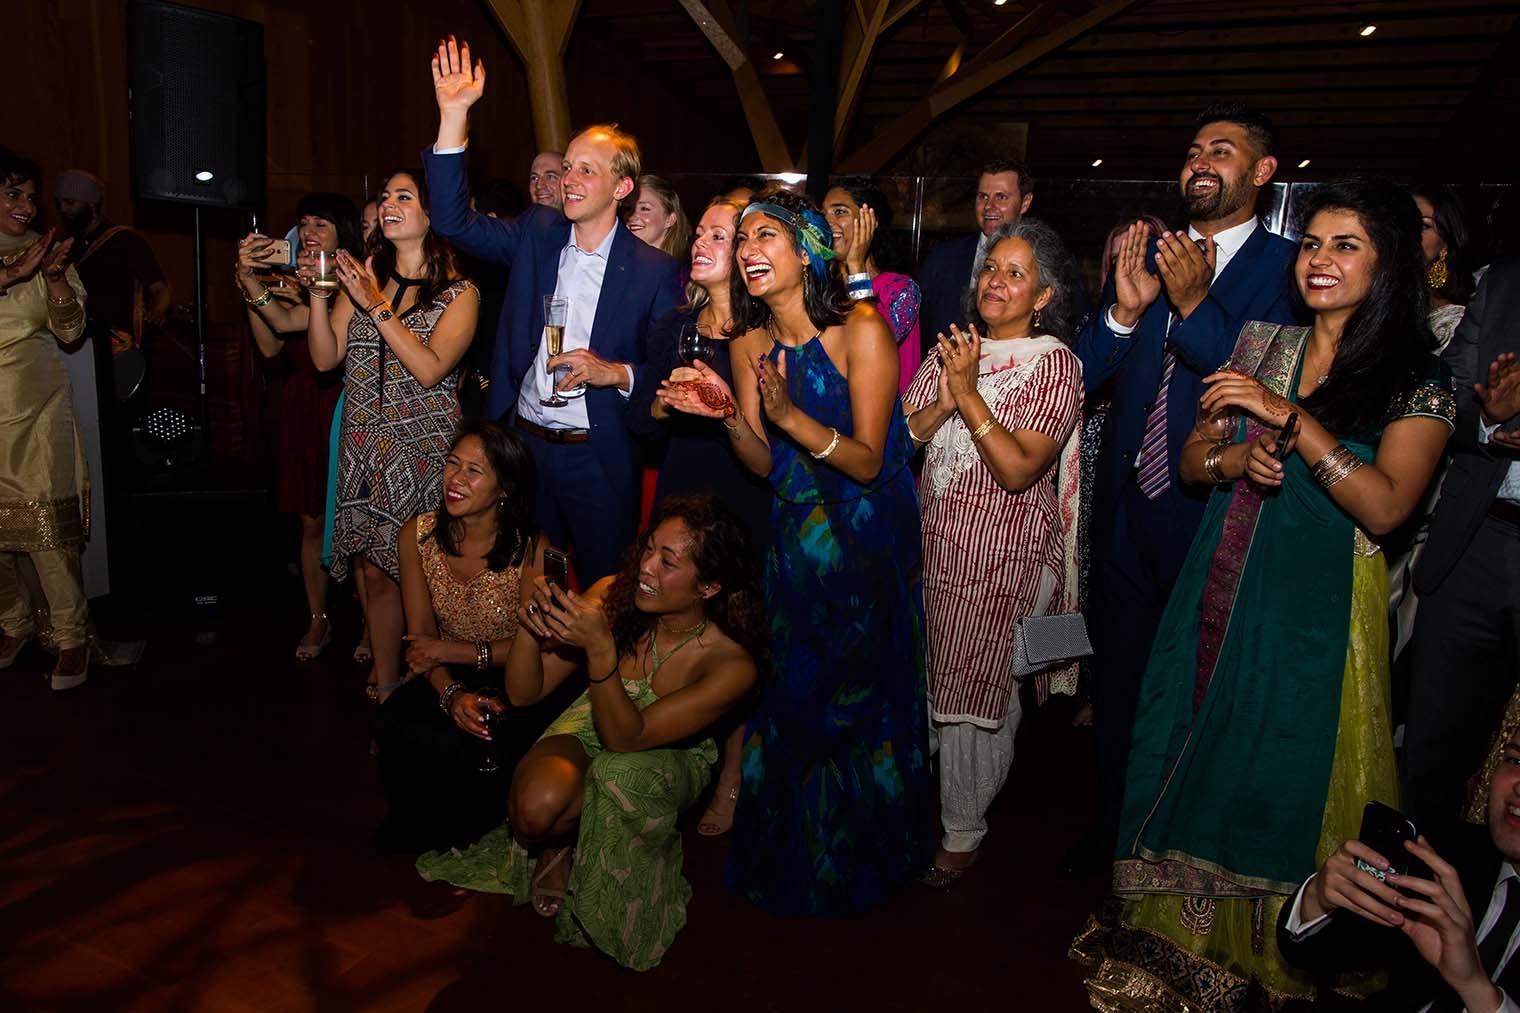 indian wedding by bay area wedding photographer